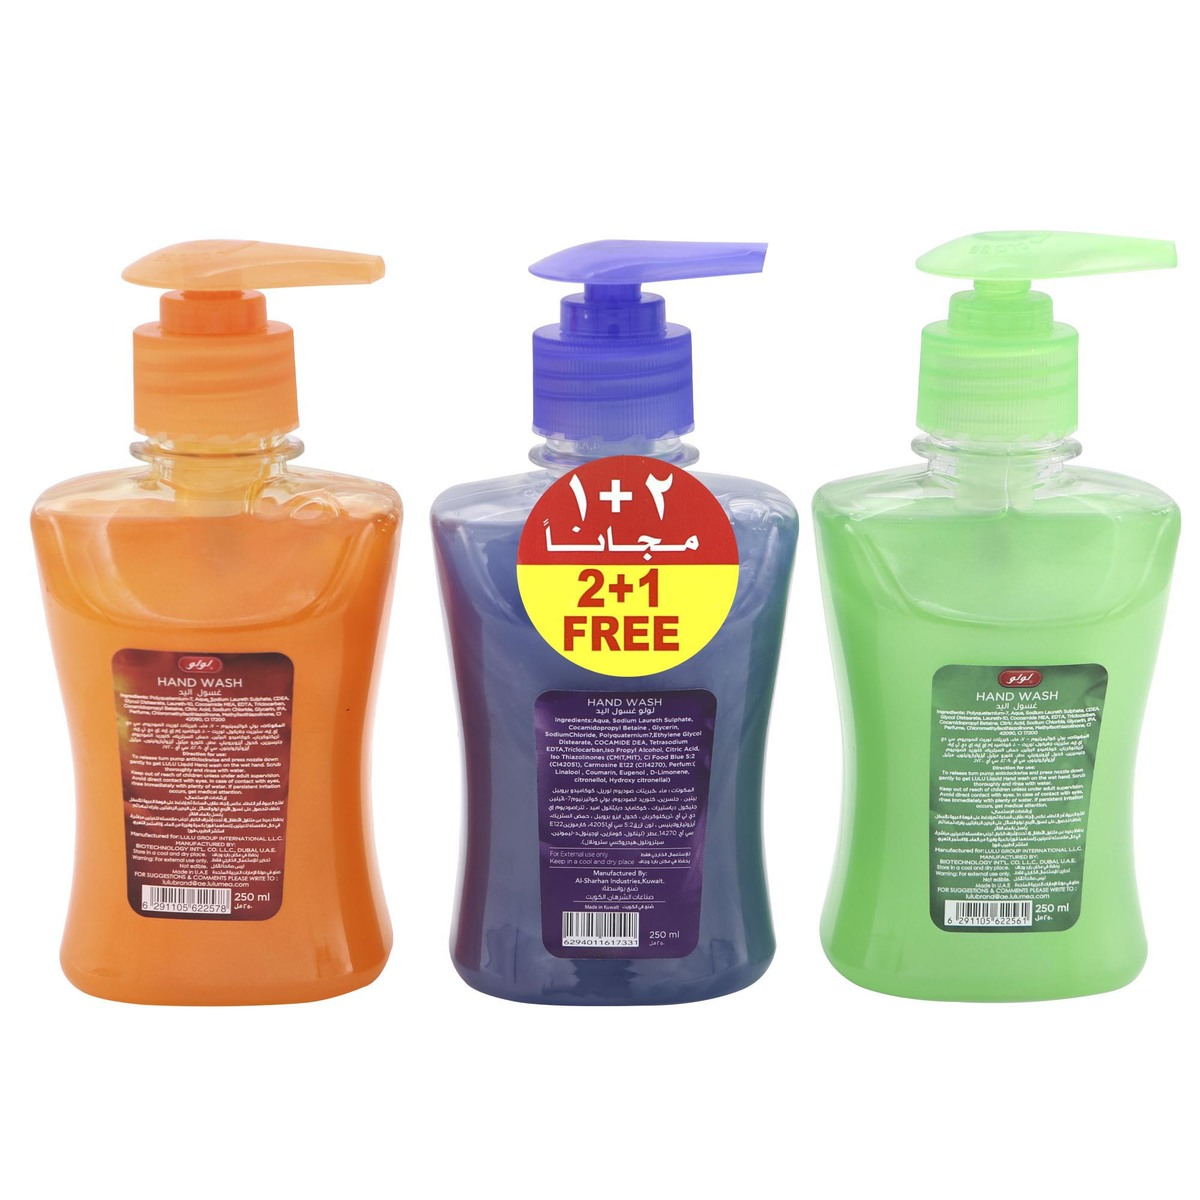 Buy Lulu Hand Wash Anti Bacterial Assorted 3 x 250ml - Liquid Hand